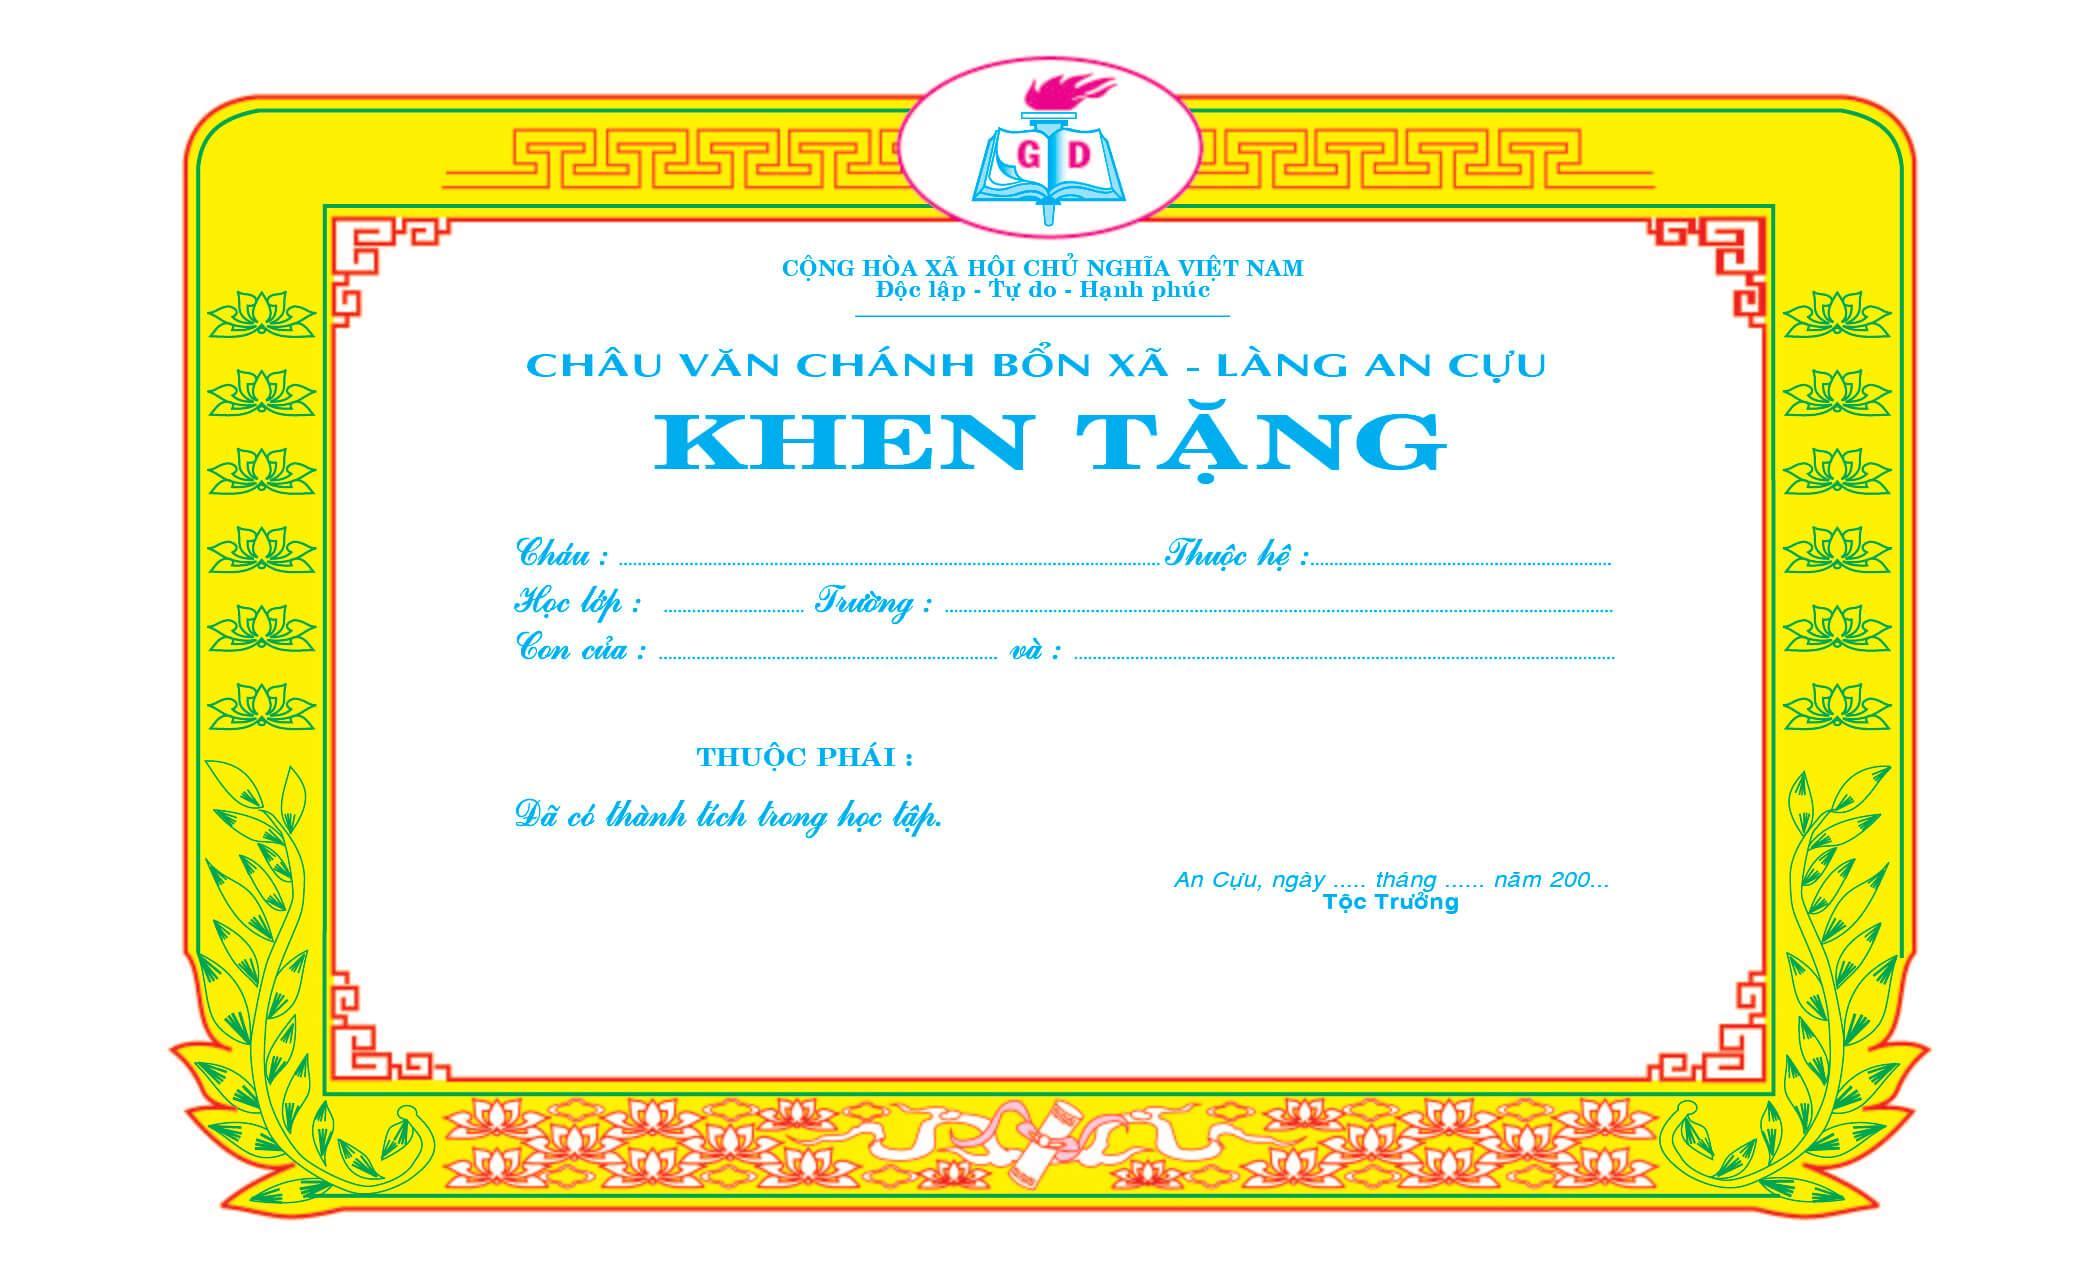 Mẫu giấy khen 028 - mẫu giấy khen làng - Link Download : https://adsnew.net/vKSt